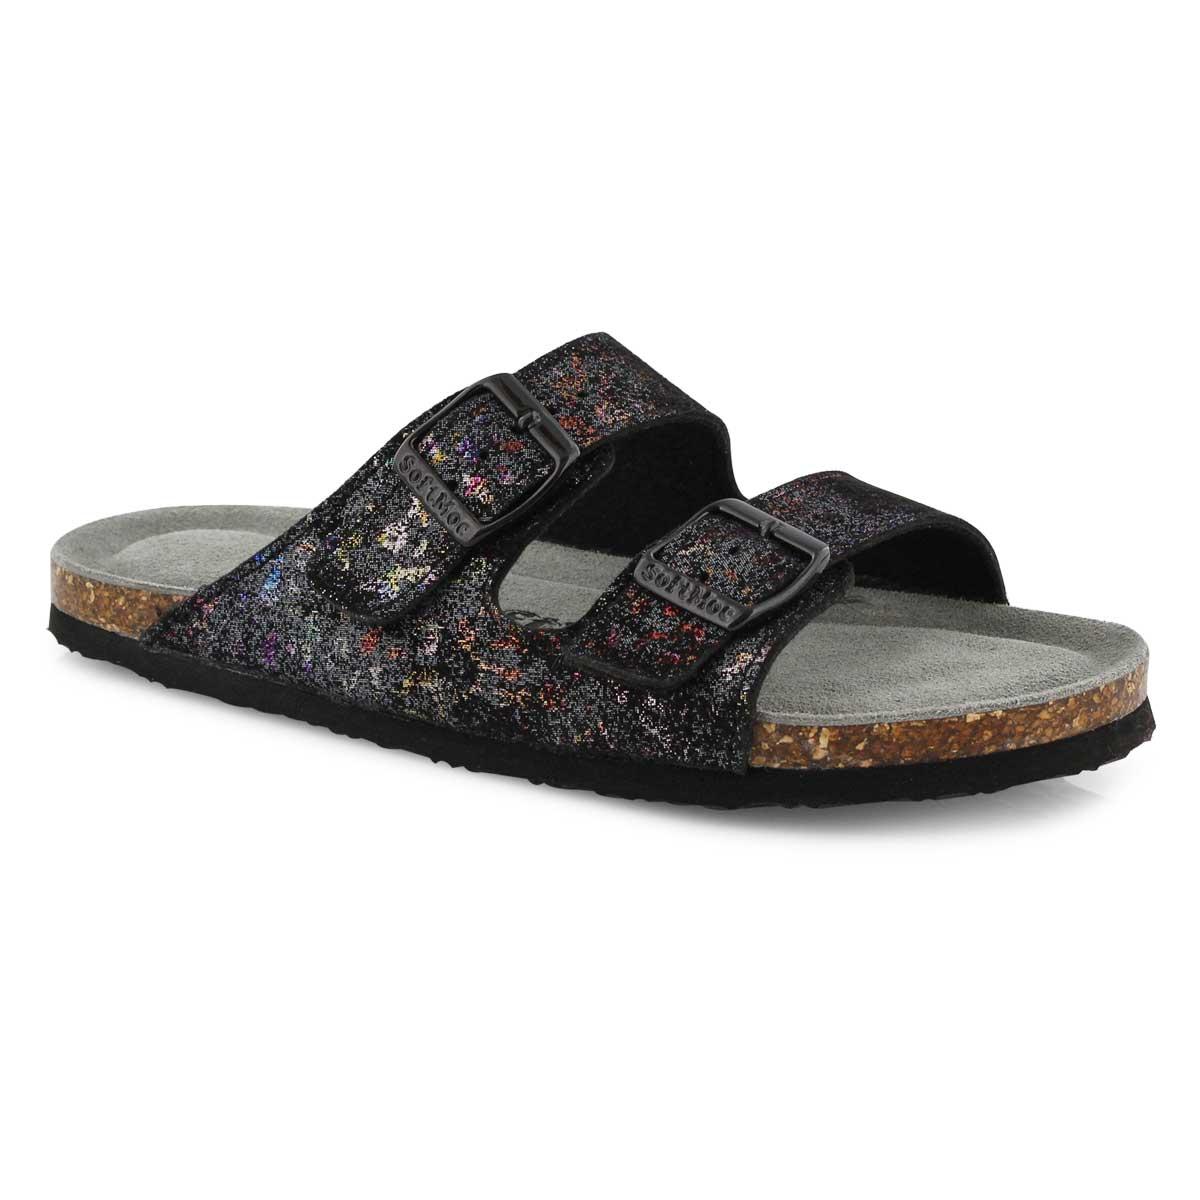 Lds Anna Slim blk mlti slide sandal